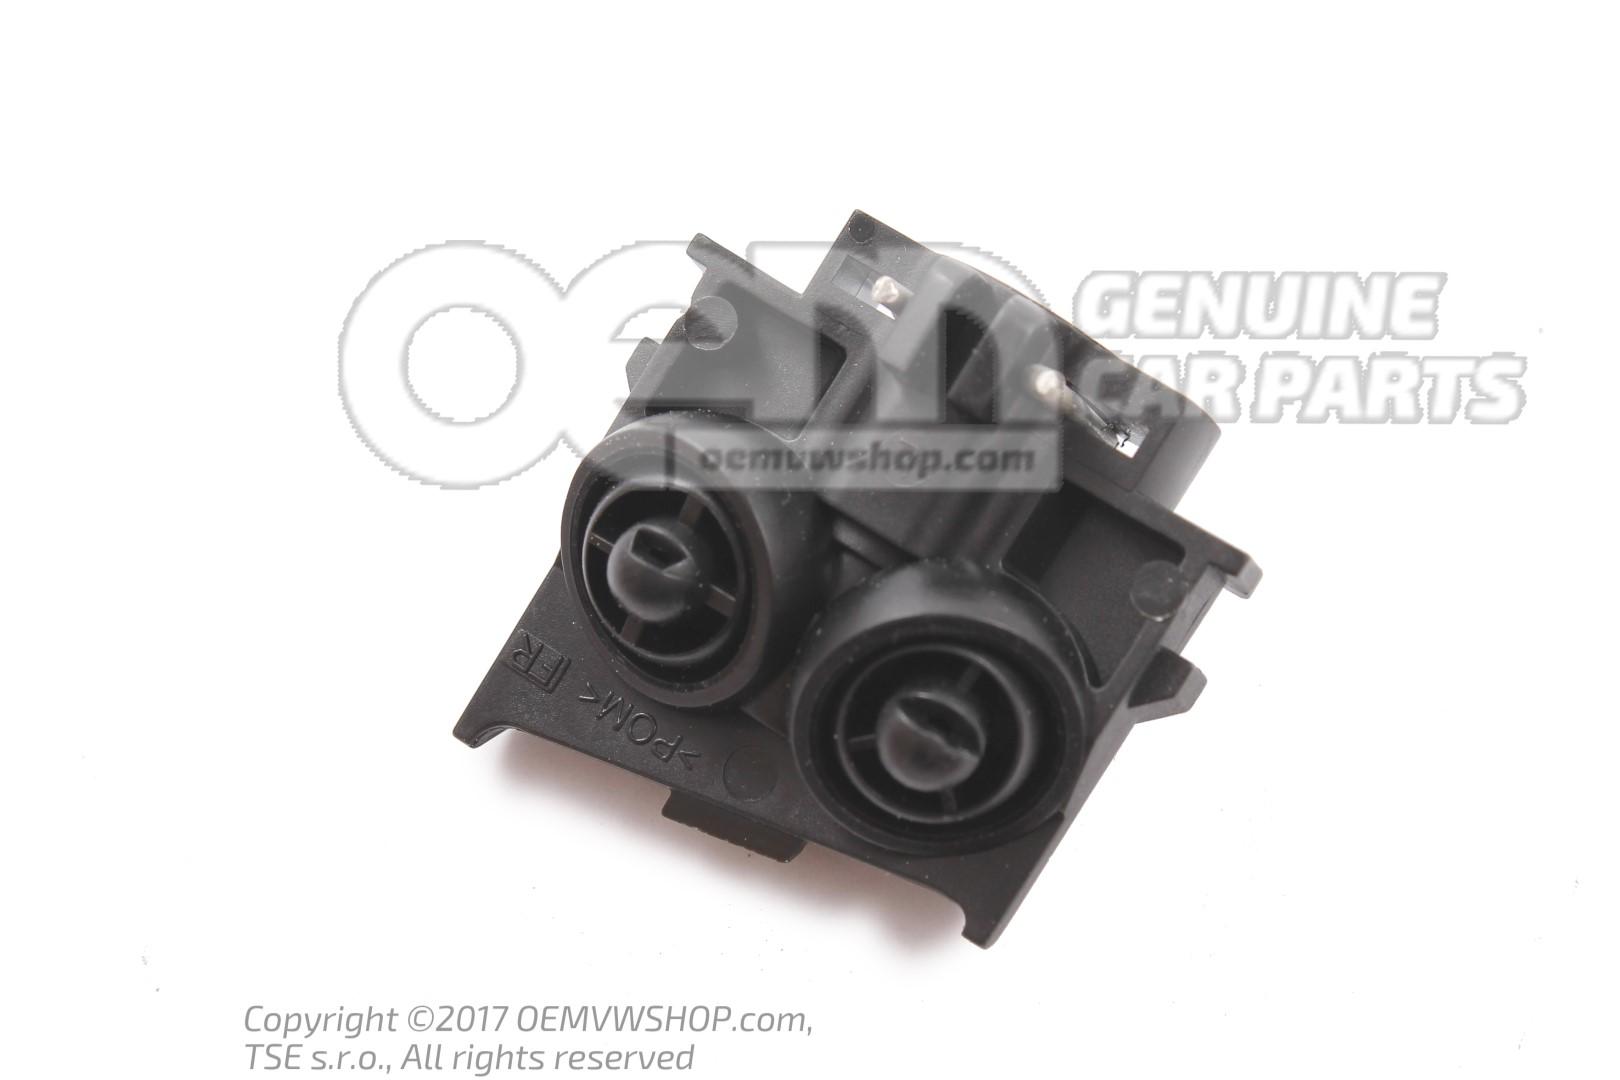 Genuine Volkswagen Nozzle Carrier Spray Nozzle Left NOS 1E0955103